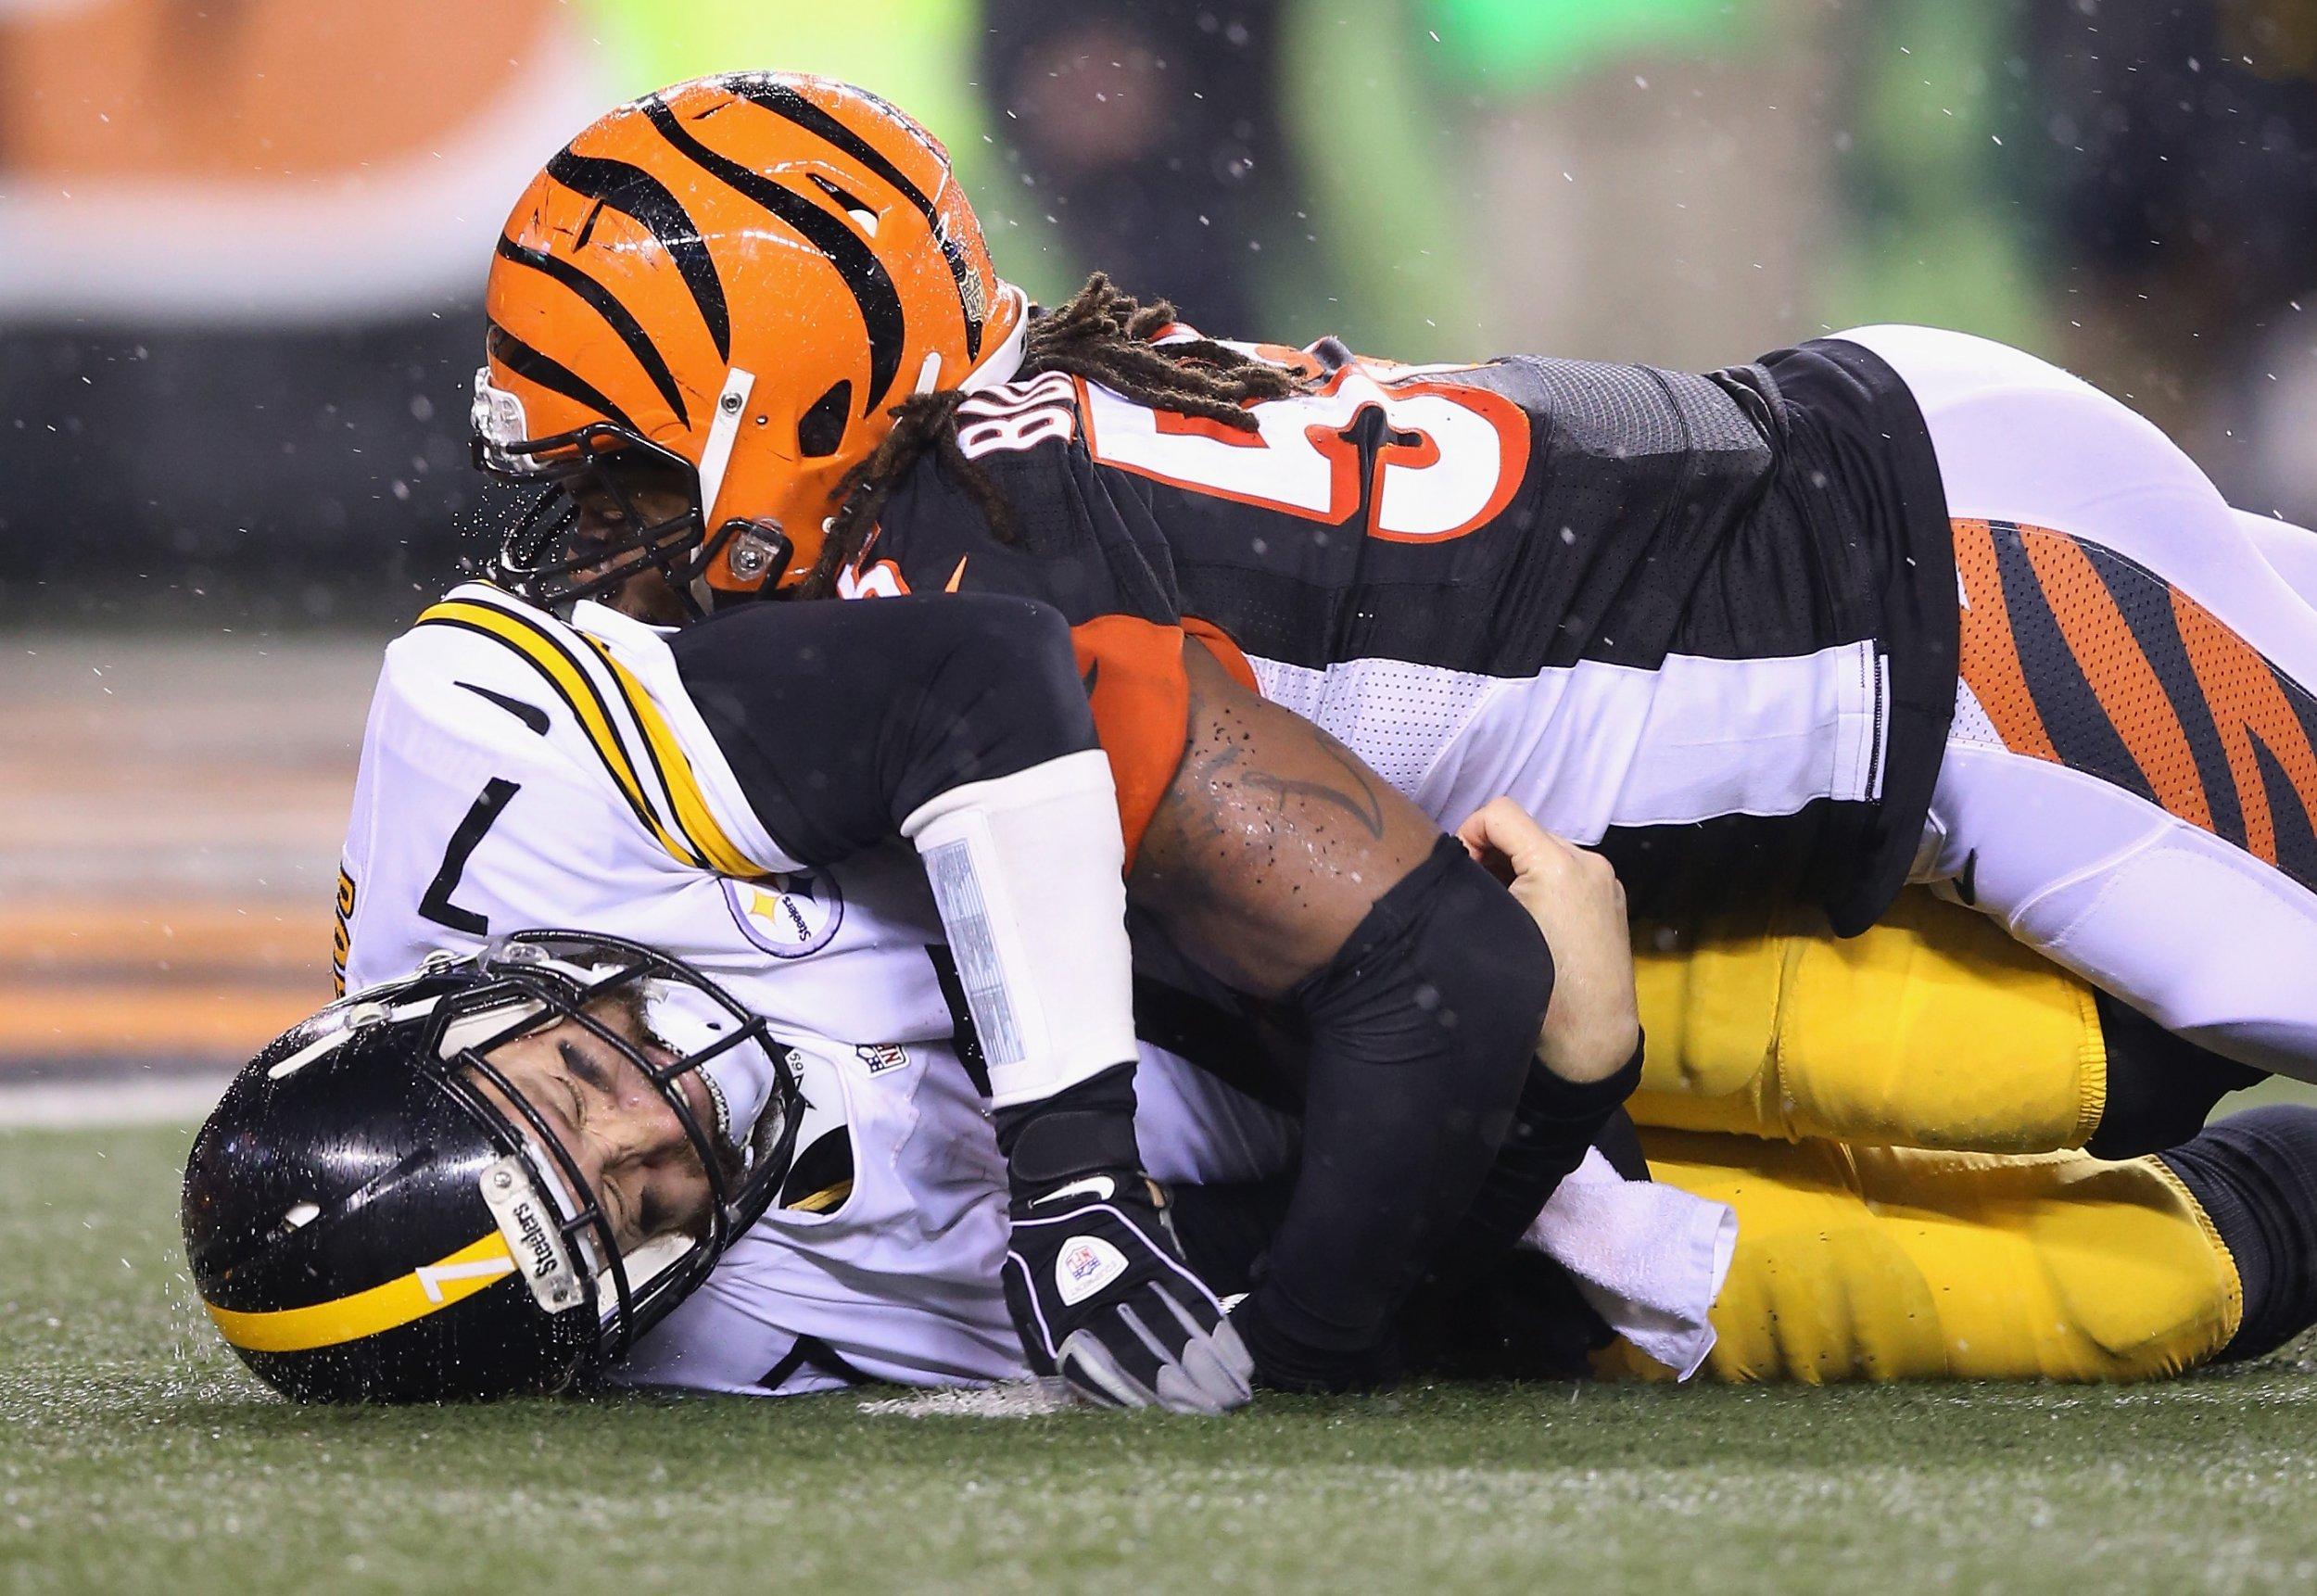 Vontaze Burfict of the Cincinnati Bengals, right, sacks Ben Roethlisberger of the Pittsburgh Steelers at Paul Brown Stadium, Cincinnati, Ohio, January 9 2016.